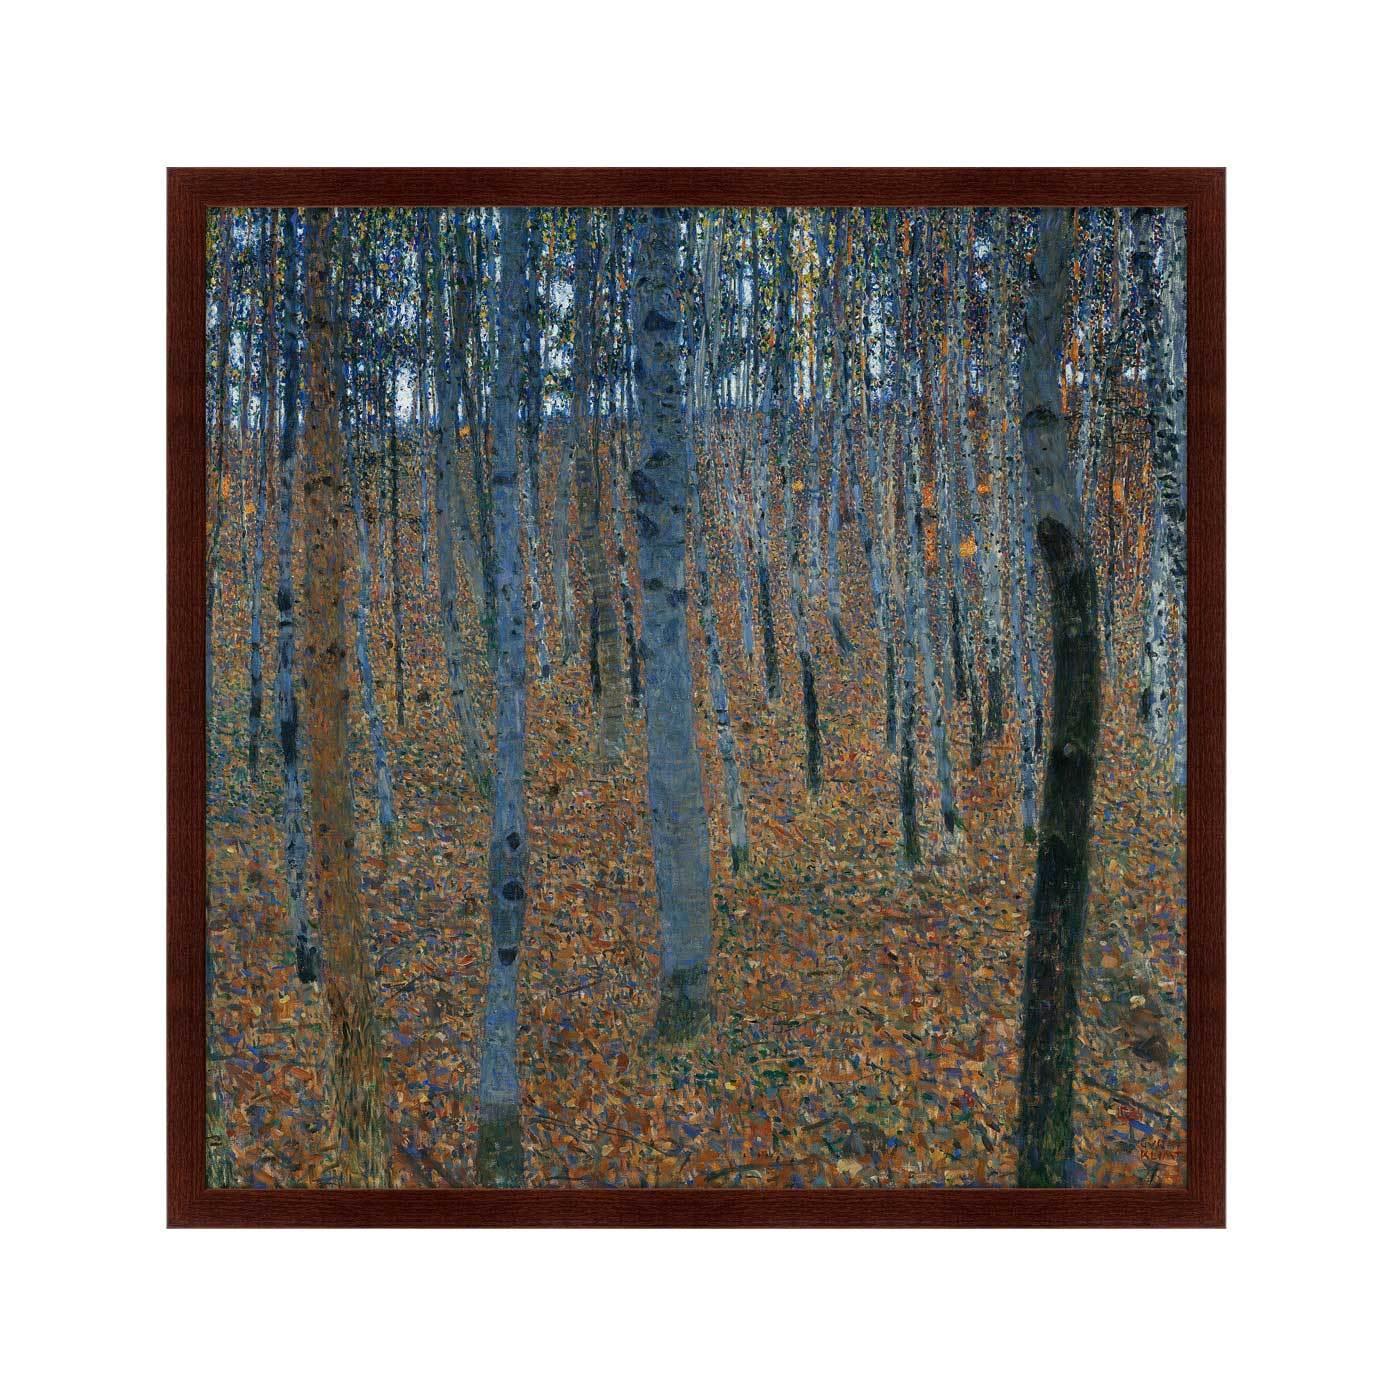 {} Картины в Квартиру Картина Beech Grove (79х79 см) картины в квартиру картина etude 3 102х130 см